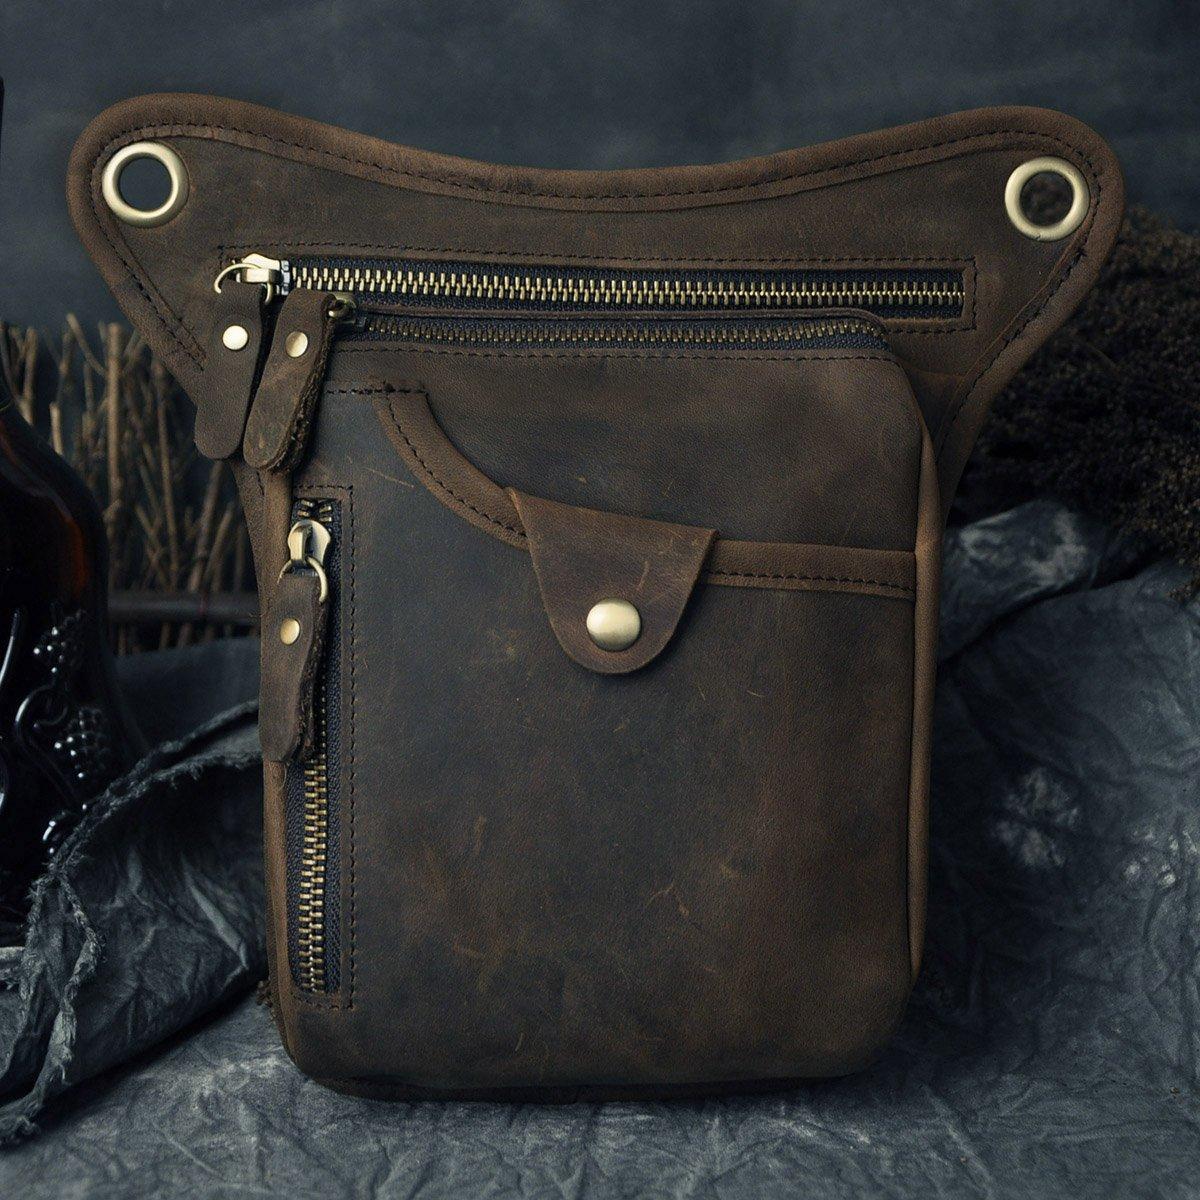 Le'aokuu Mens Genuine Leather Messenger Riding Hip Bum Waist Pack Drop Leg Cross Over Bag (The Black)